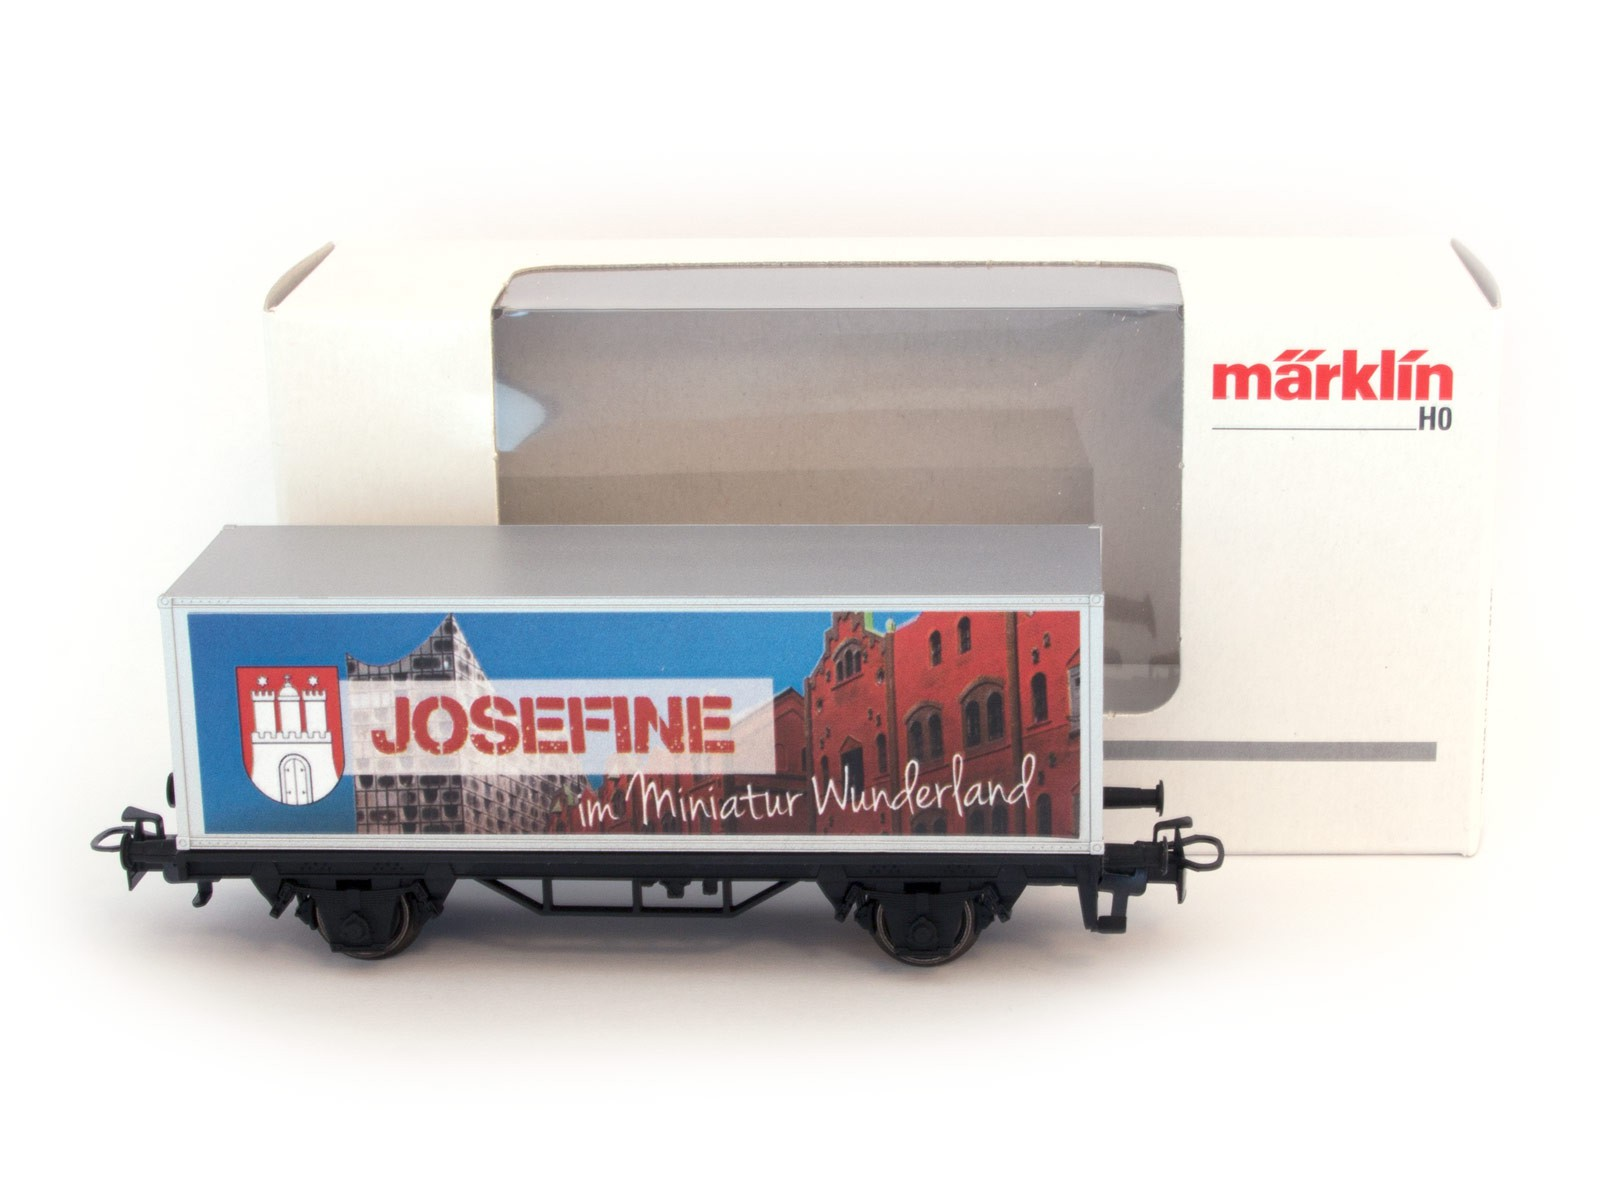 Miniatur Wunderland / Märklin H0 special wagon with YOUR NAME